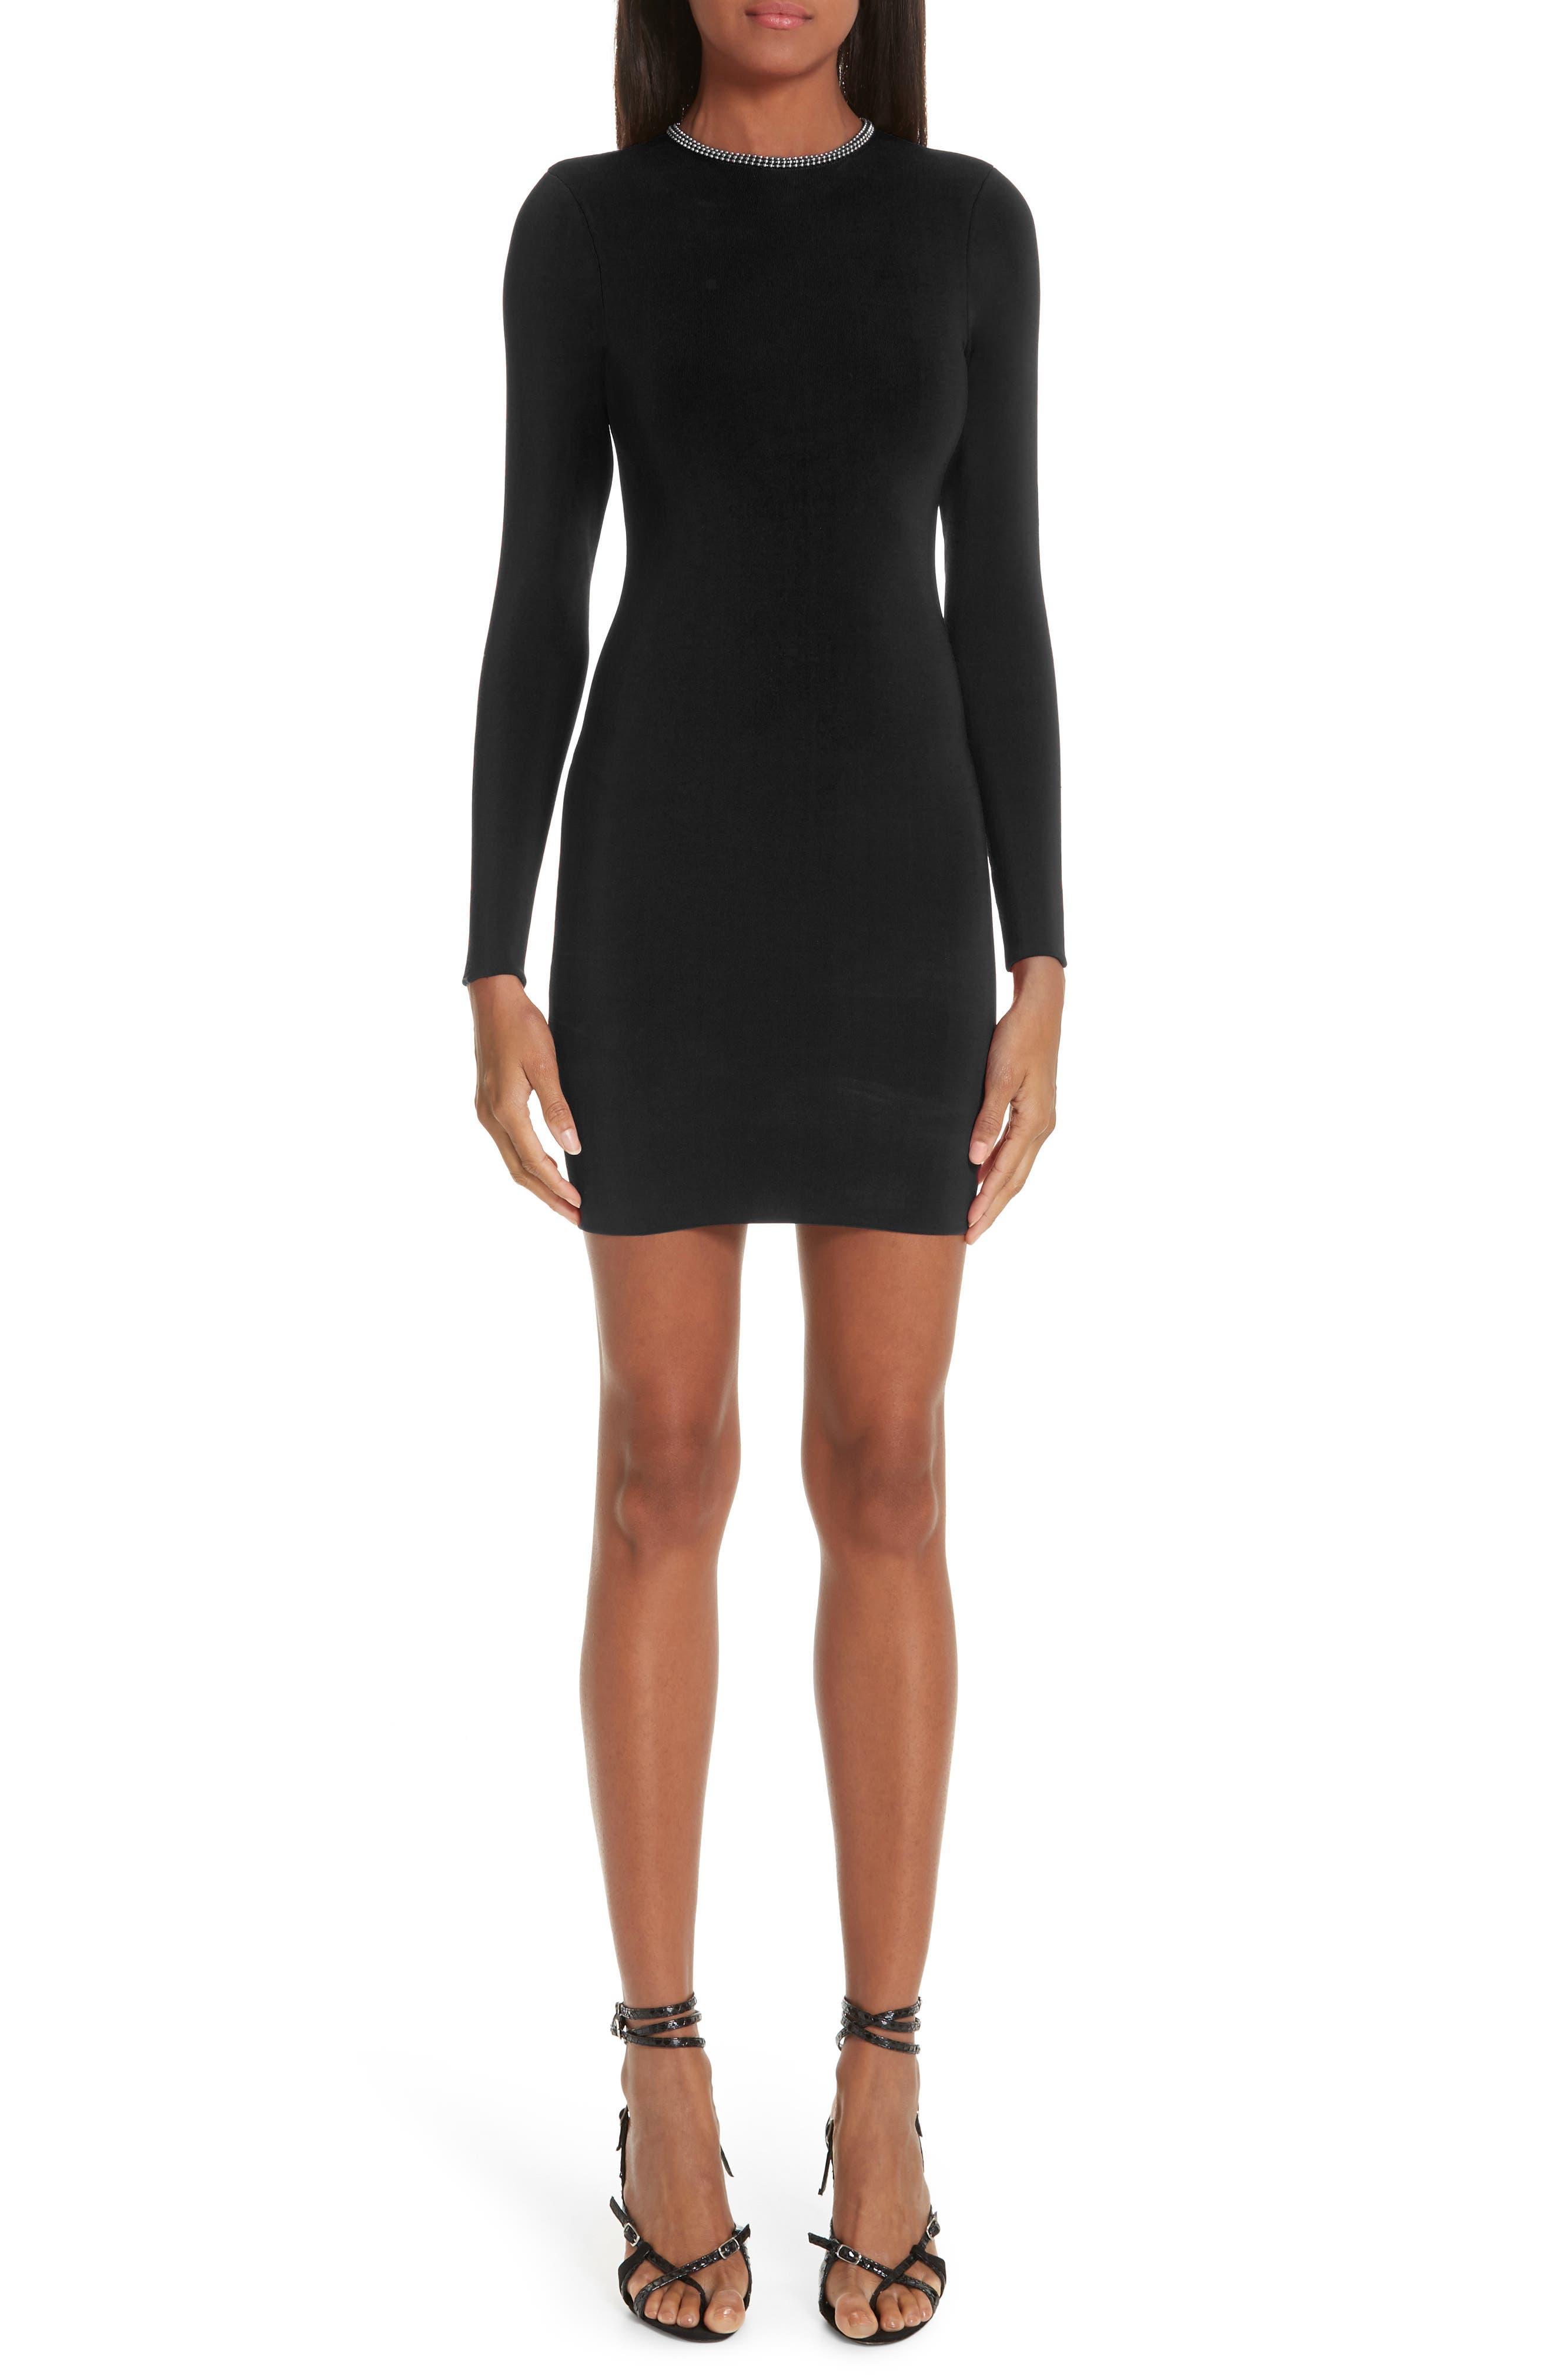 Alexander Wang Ball Chain Trim Body-Con Dress, Black